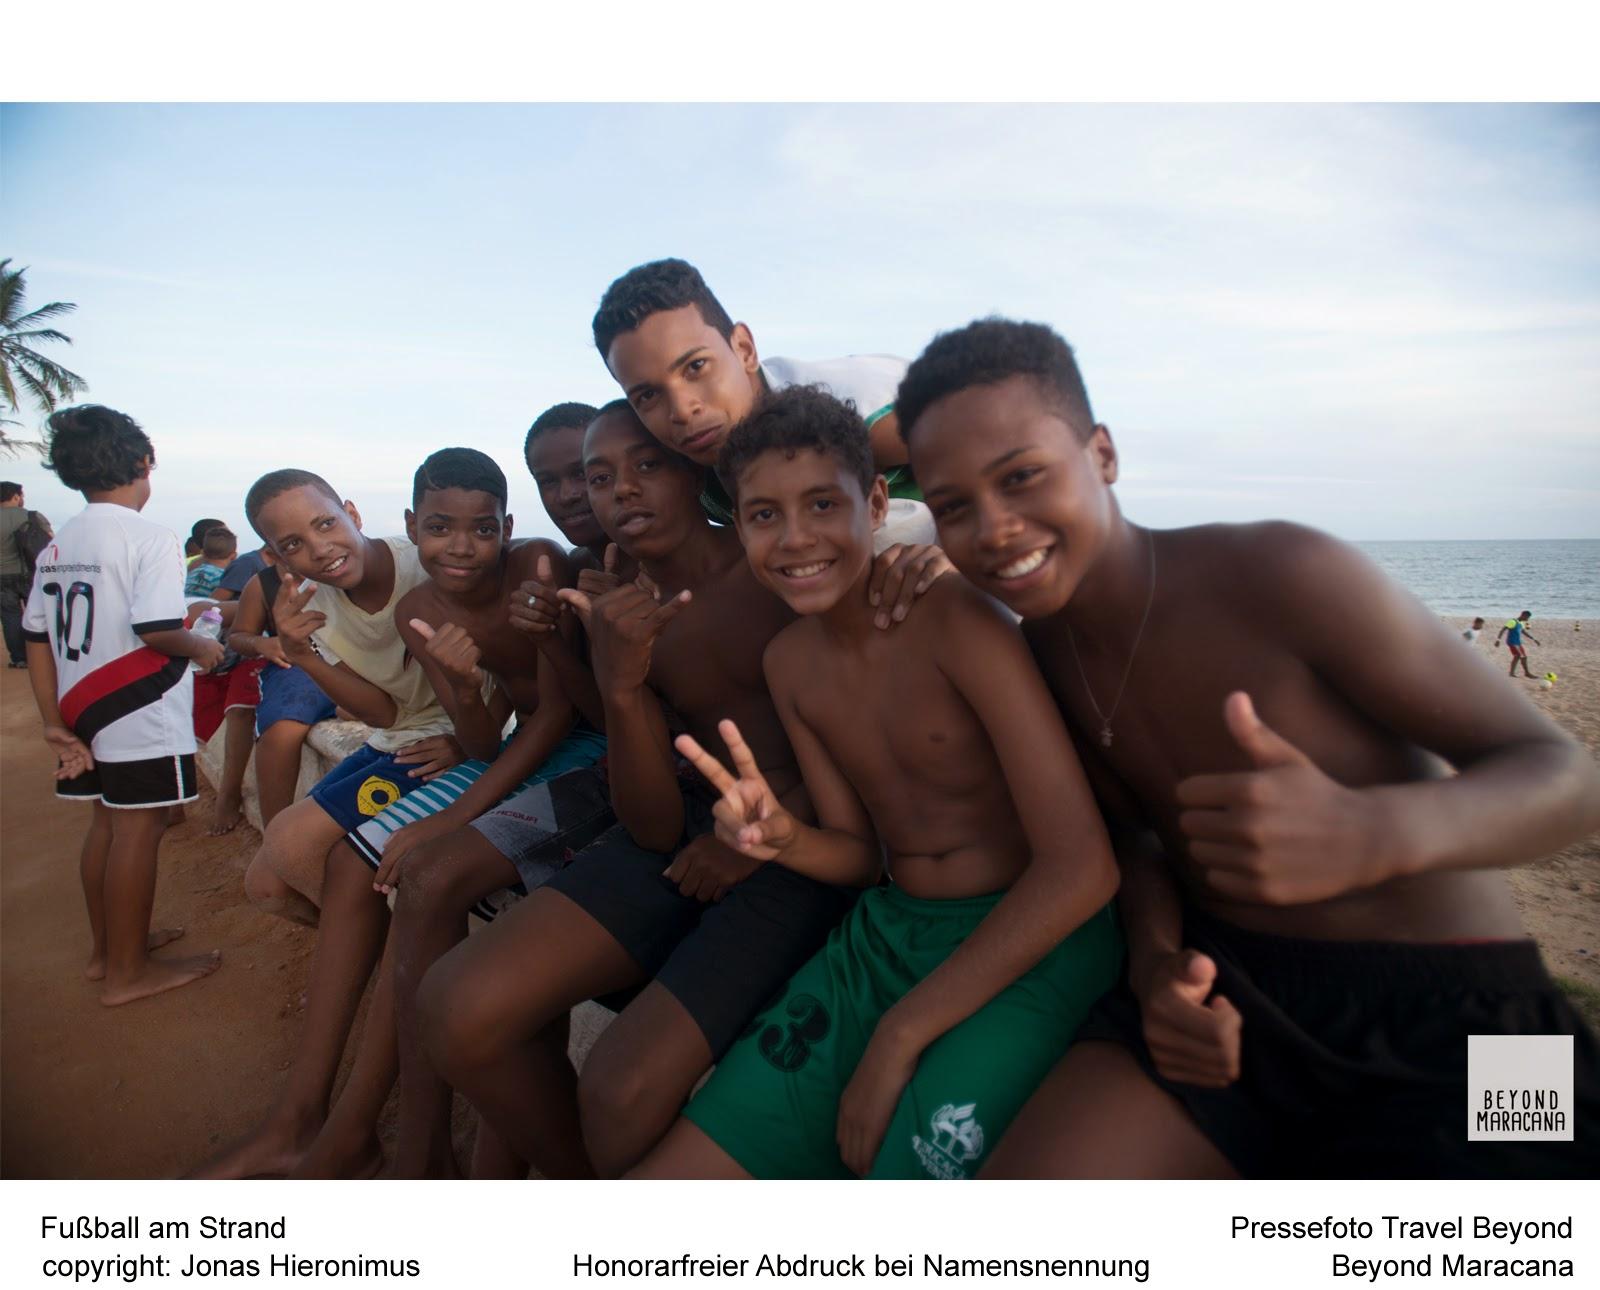 O projeto multimídia Beyond Maracana